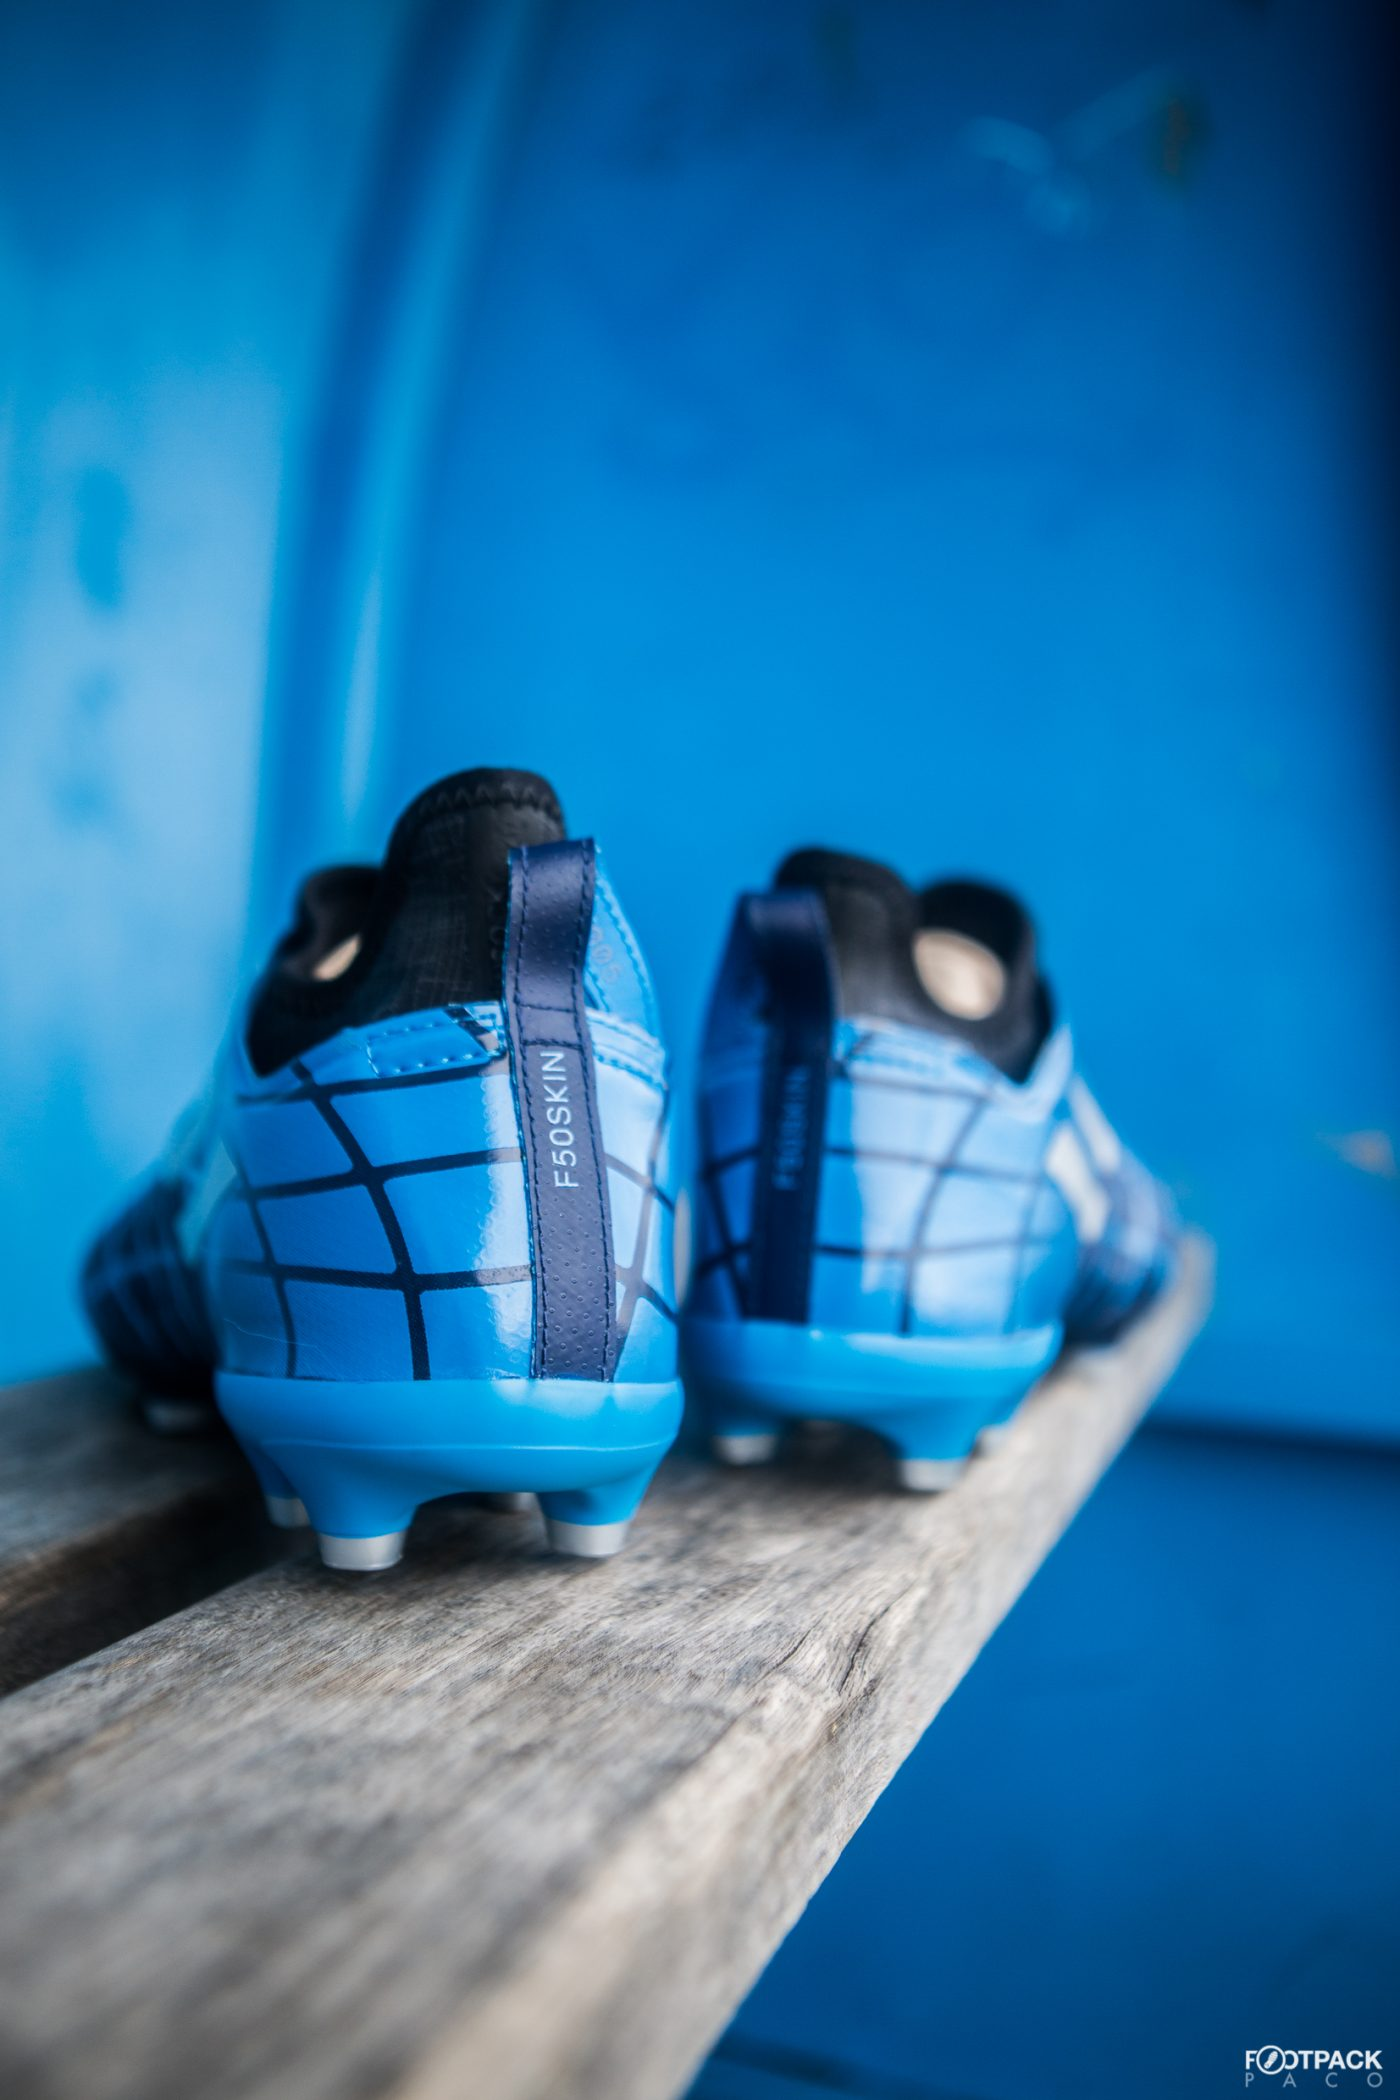 adidas-glitch-classic-pack-skin-F50-araignee-2005-footpack-3